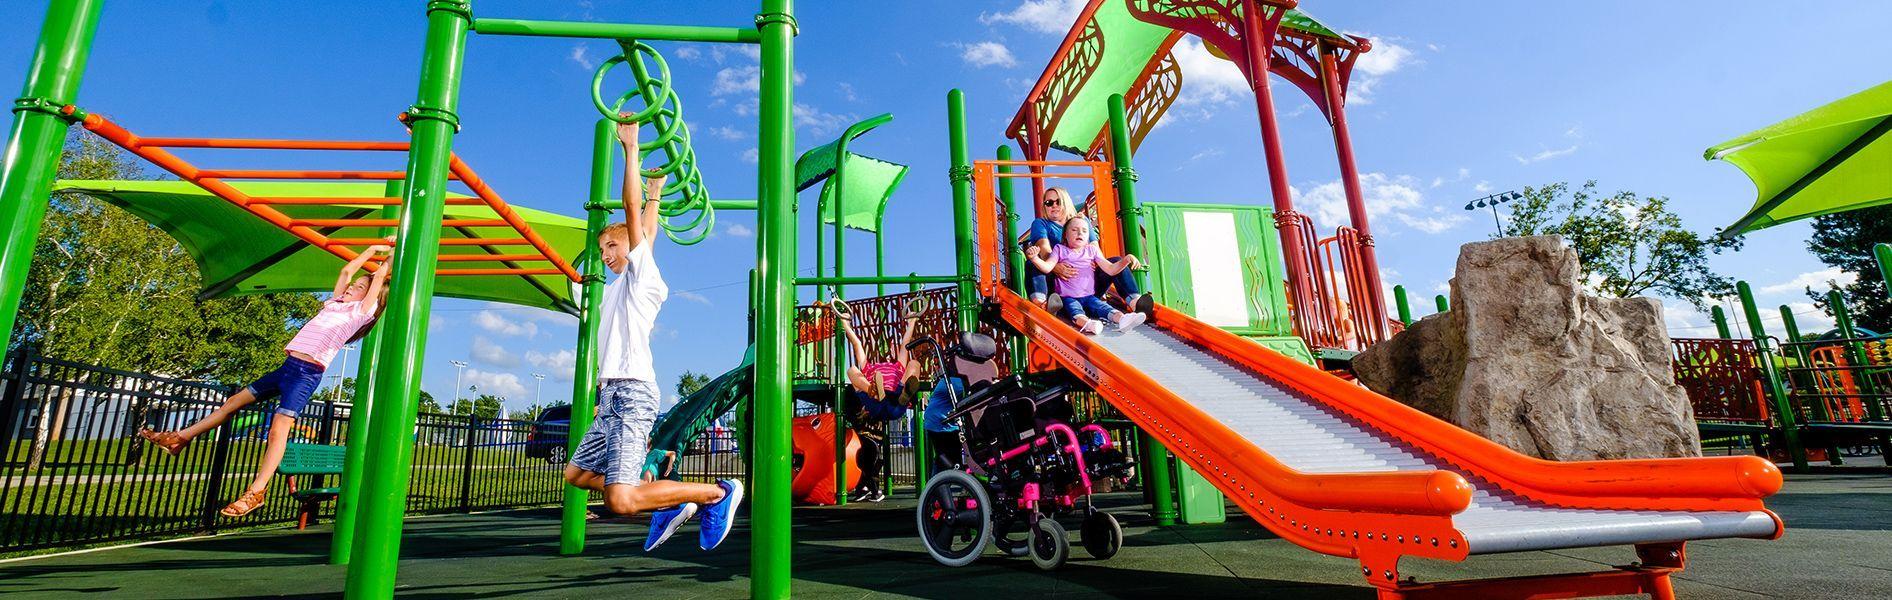 Child sliding down roller slide and kids hanging on monkey bars